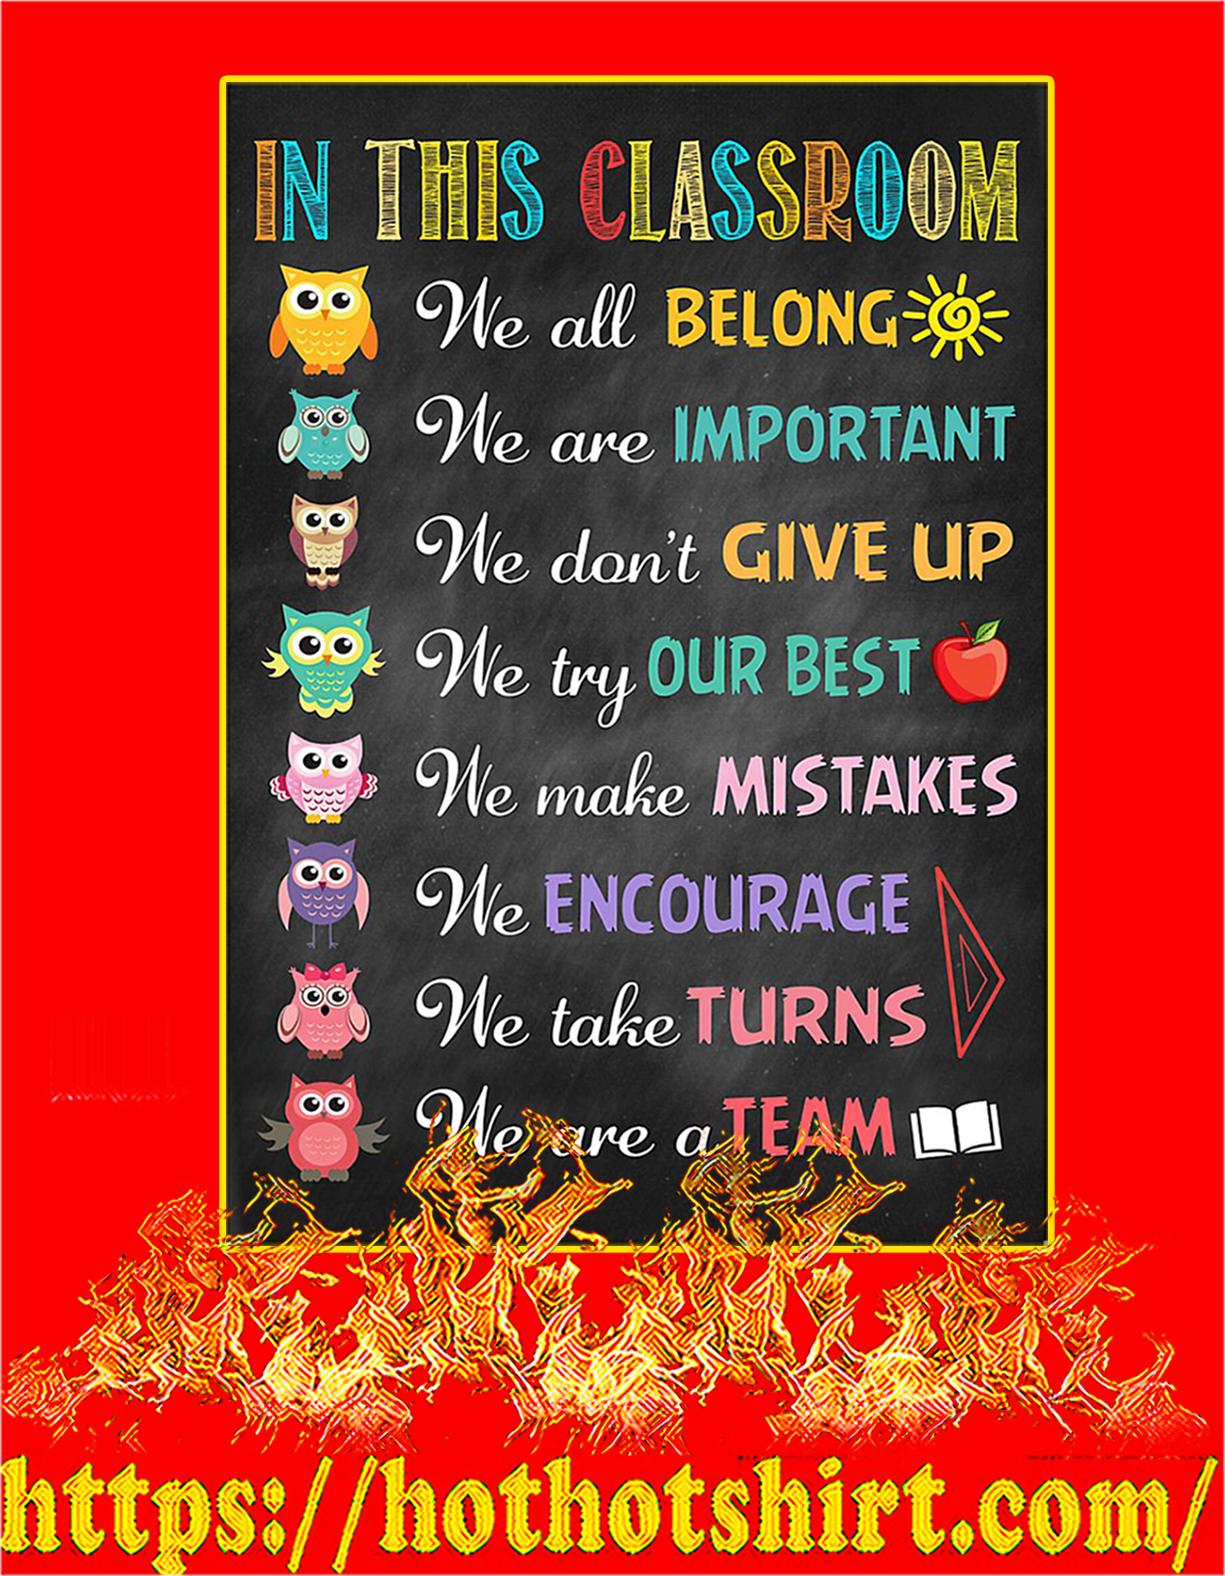 Owl teacher in this classroom we all belong poster - A4